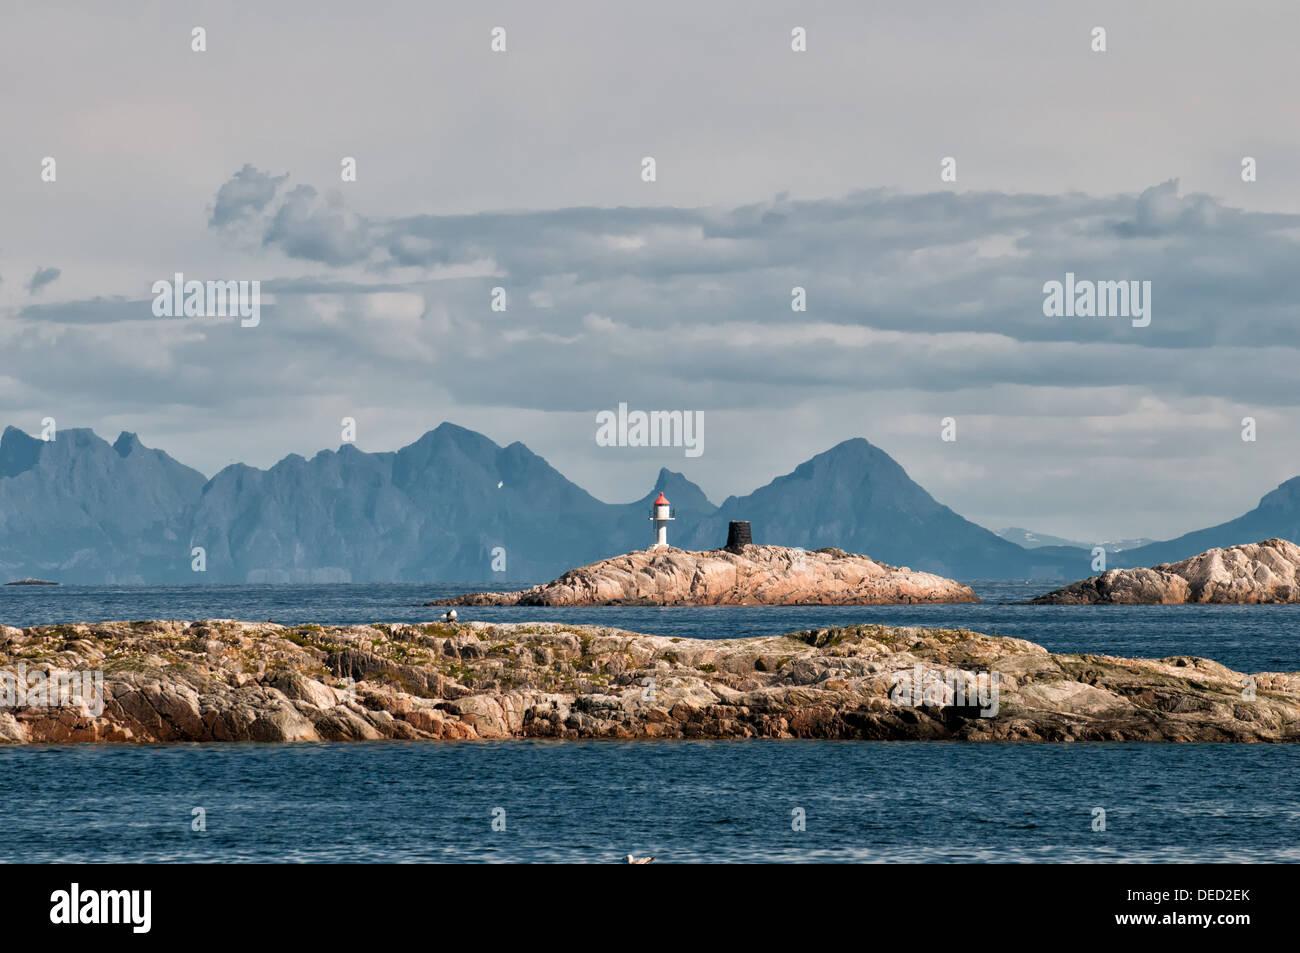 Archipelago at Henningsvaer, Lofoten - Stock Image